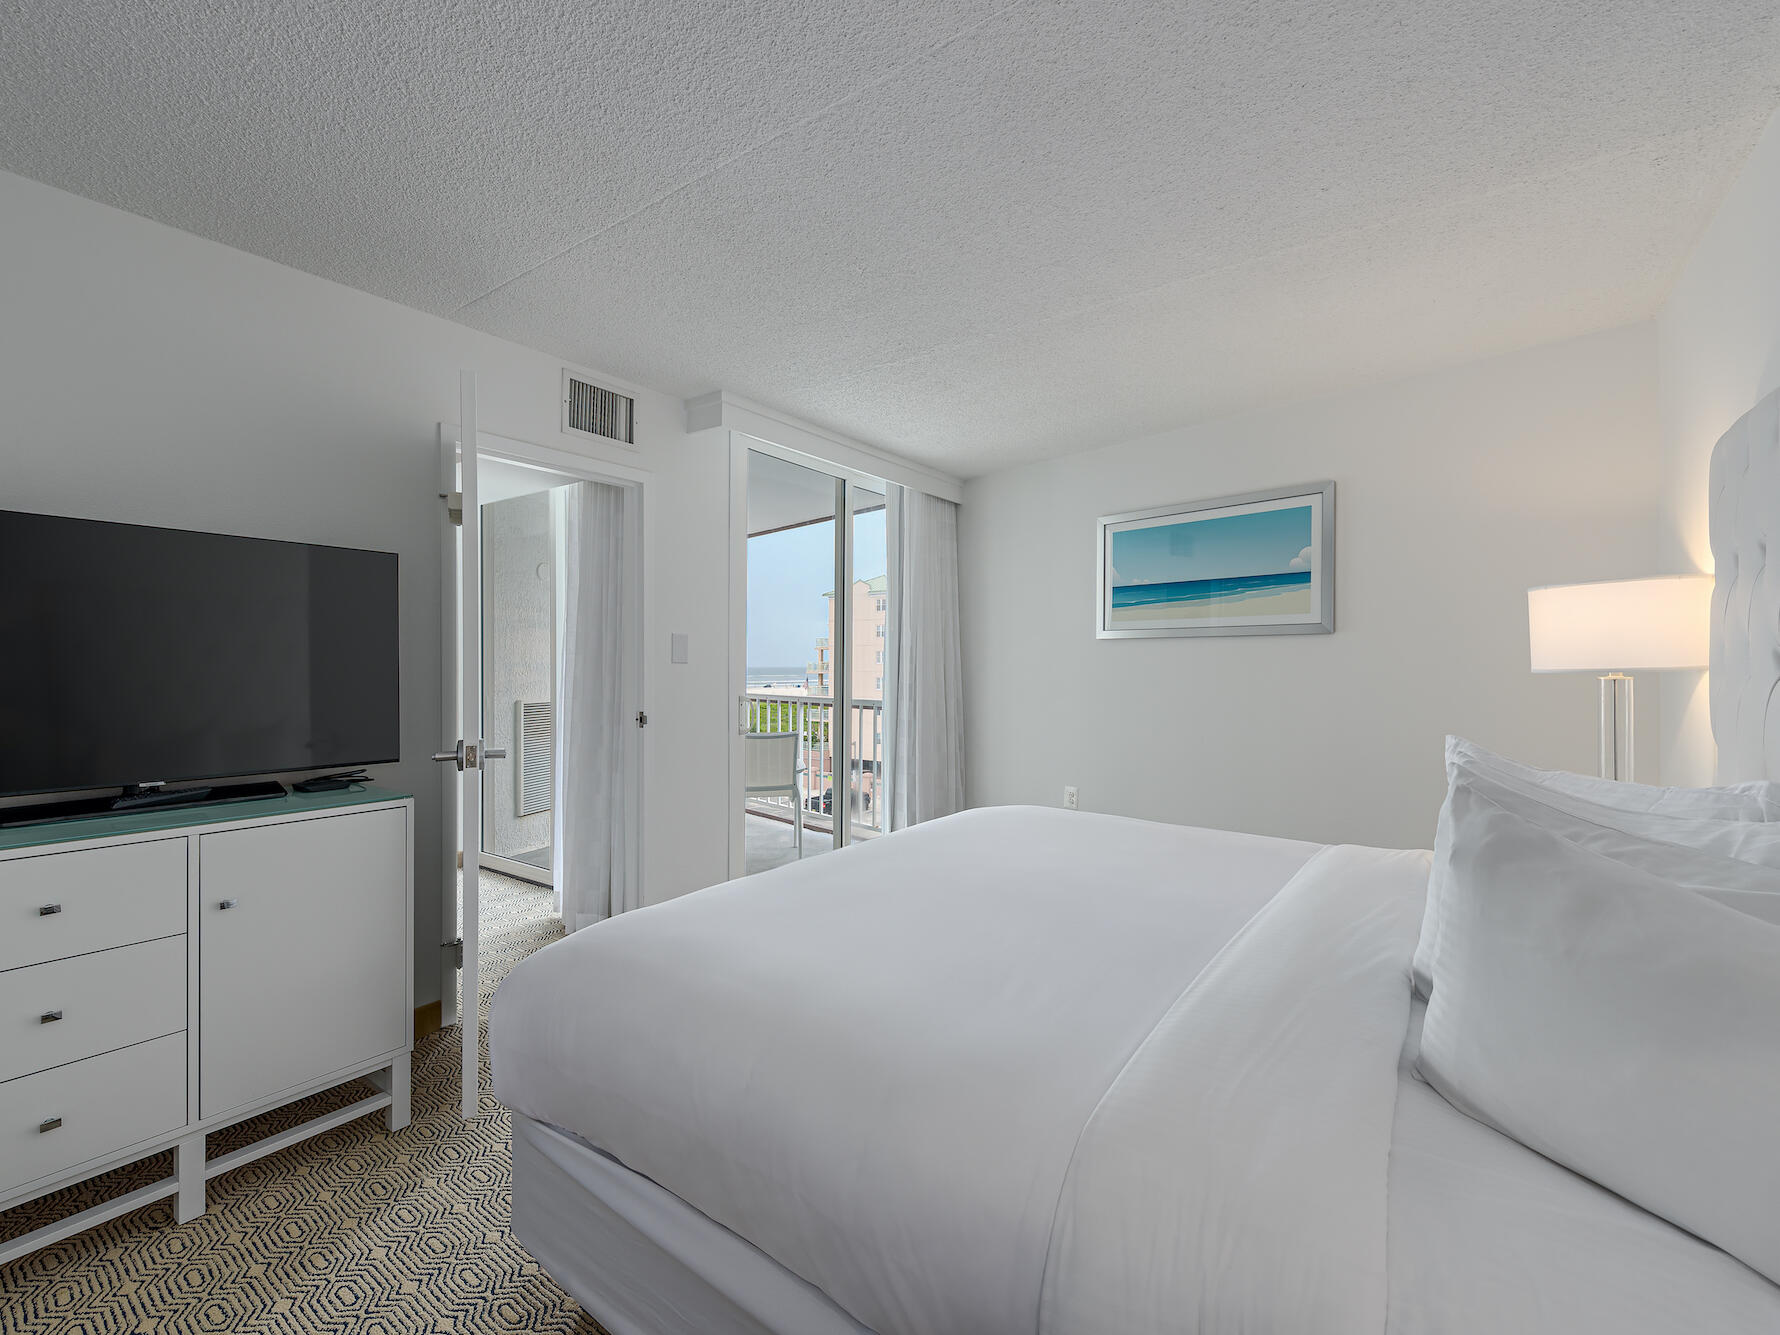 Premium Poolside King Suite Beachfront Resort the Wildwoods NJ